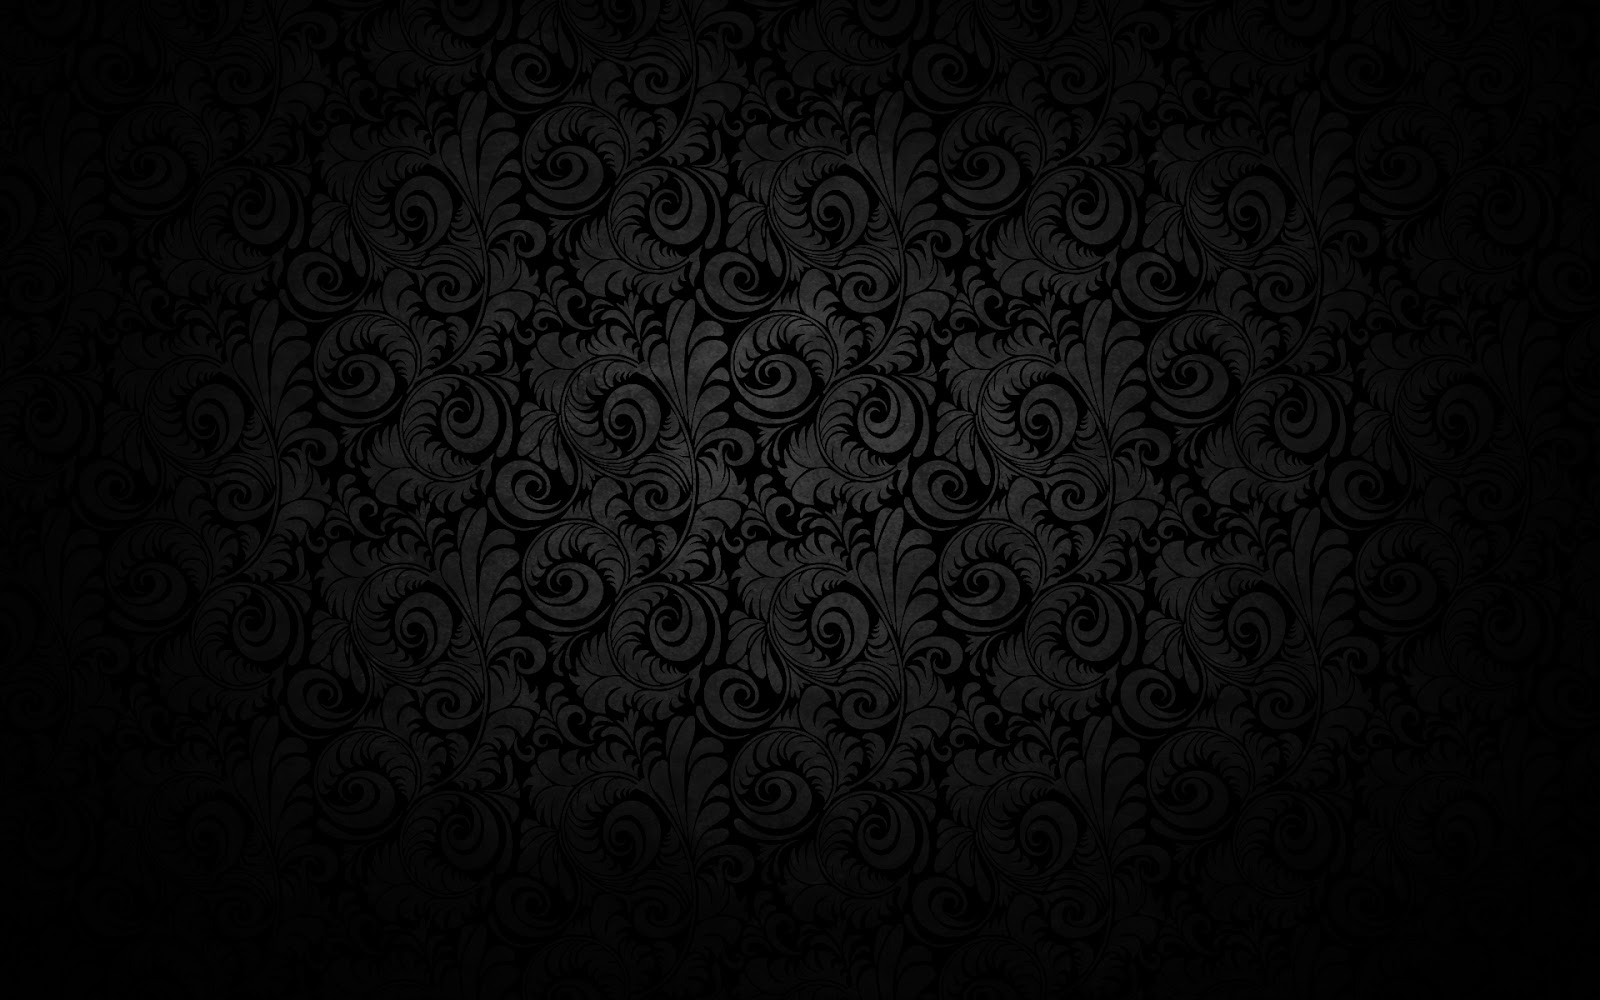 Dark background grey floral pattern HD texture image free downloadjpg 1600x1000